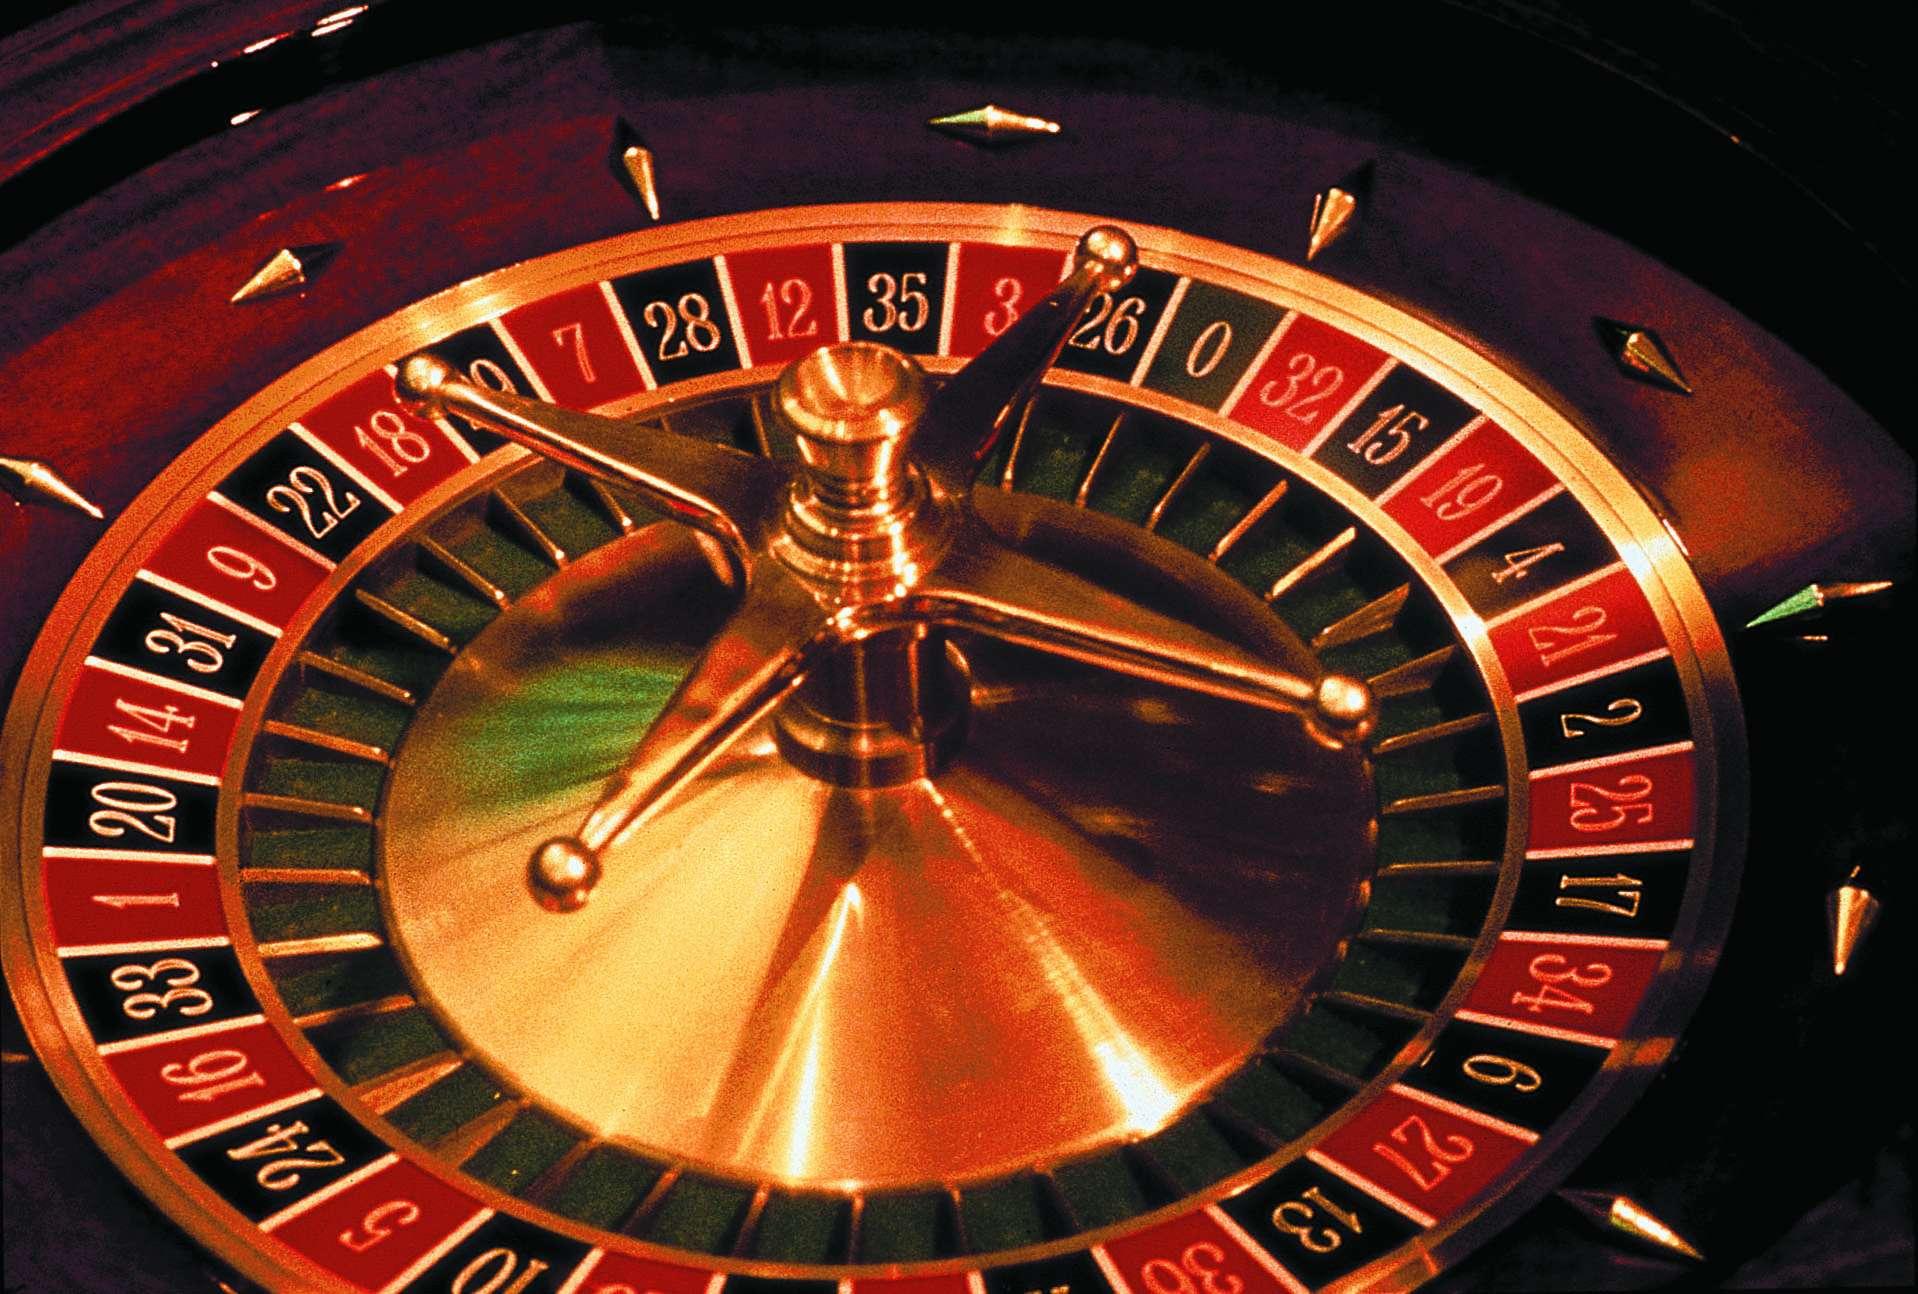 Casino en ligne : devenez un stratège